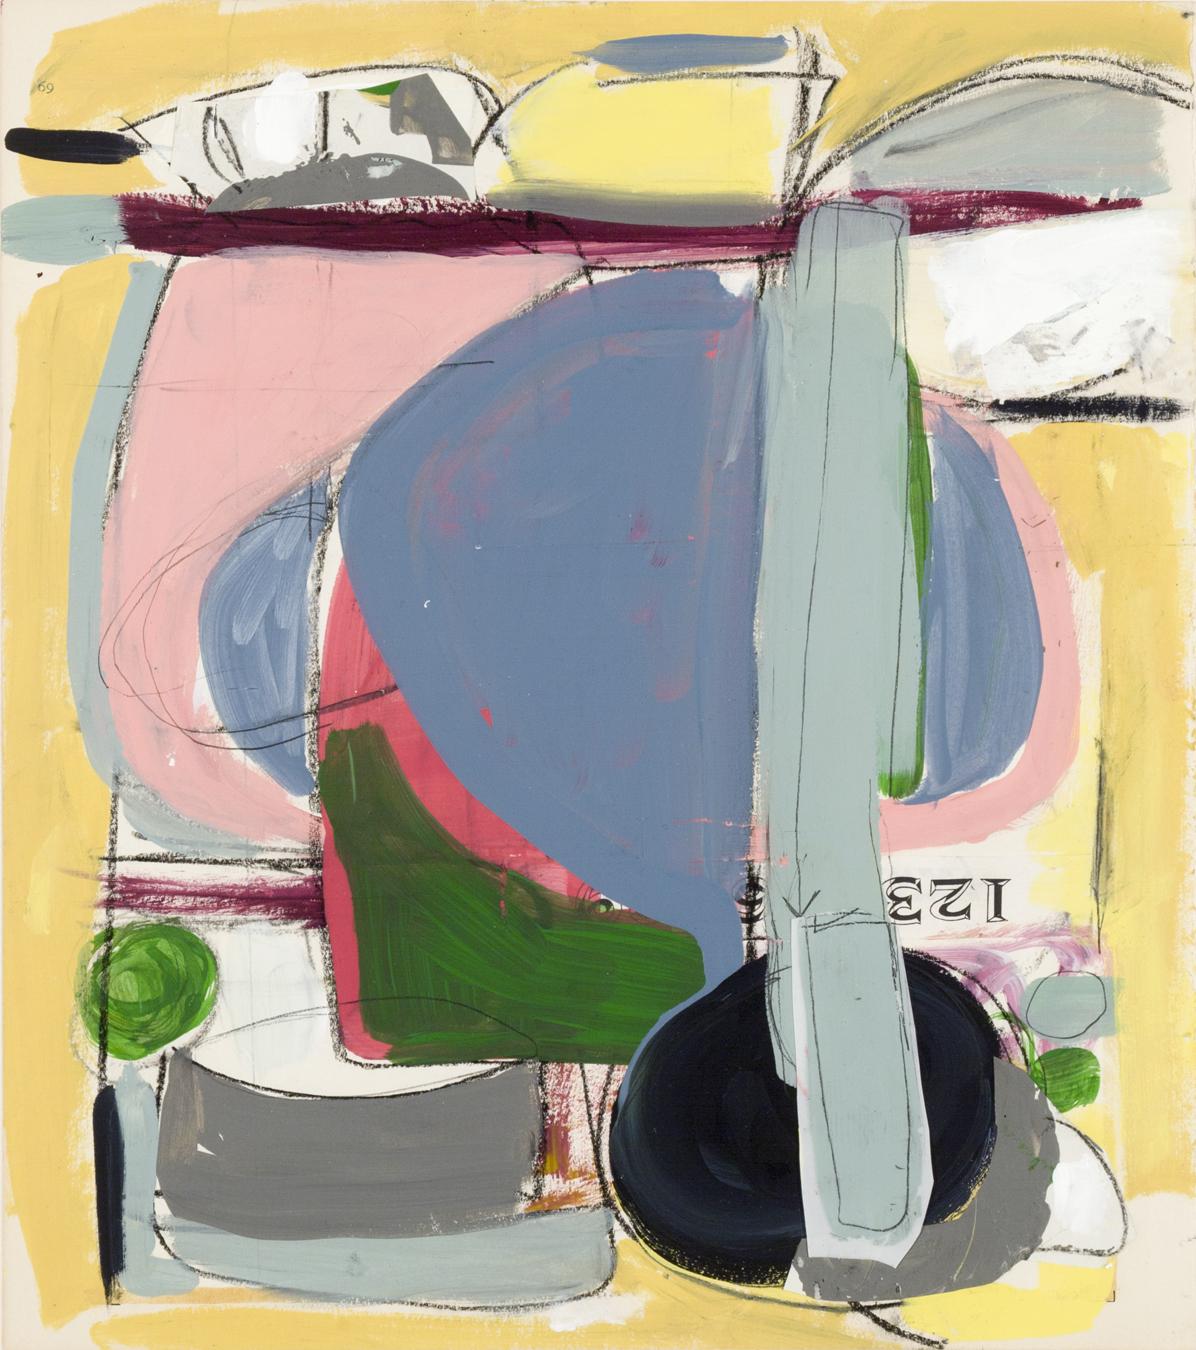 Karen Cappotto, untitled, 2011 Recipient